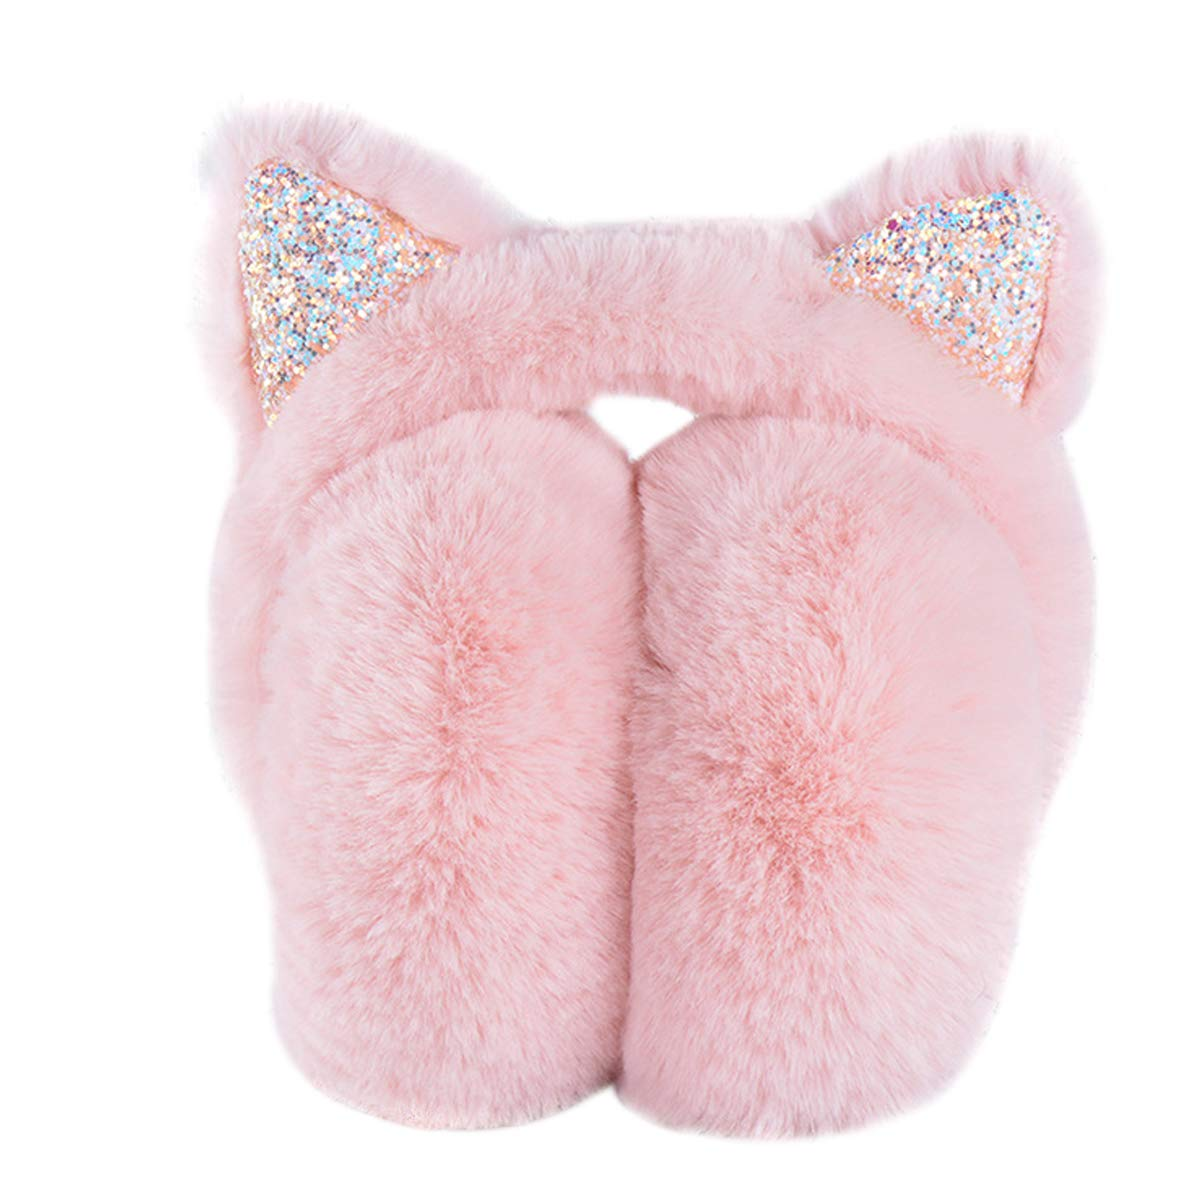 HSZL-EZ012-PINK-JP pink Elezay Unisex Foldable Ear Warmers Polar Winter EarMuffs Outdoor Cold Weather